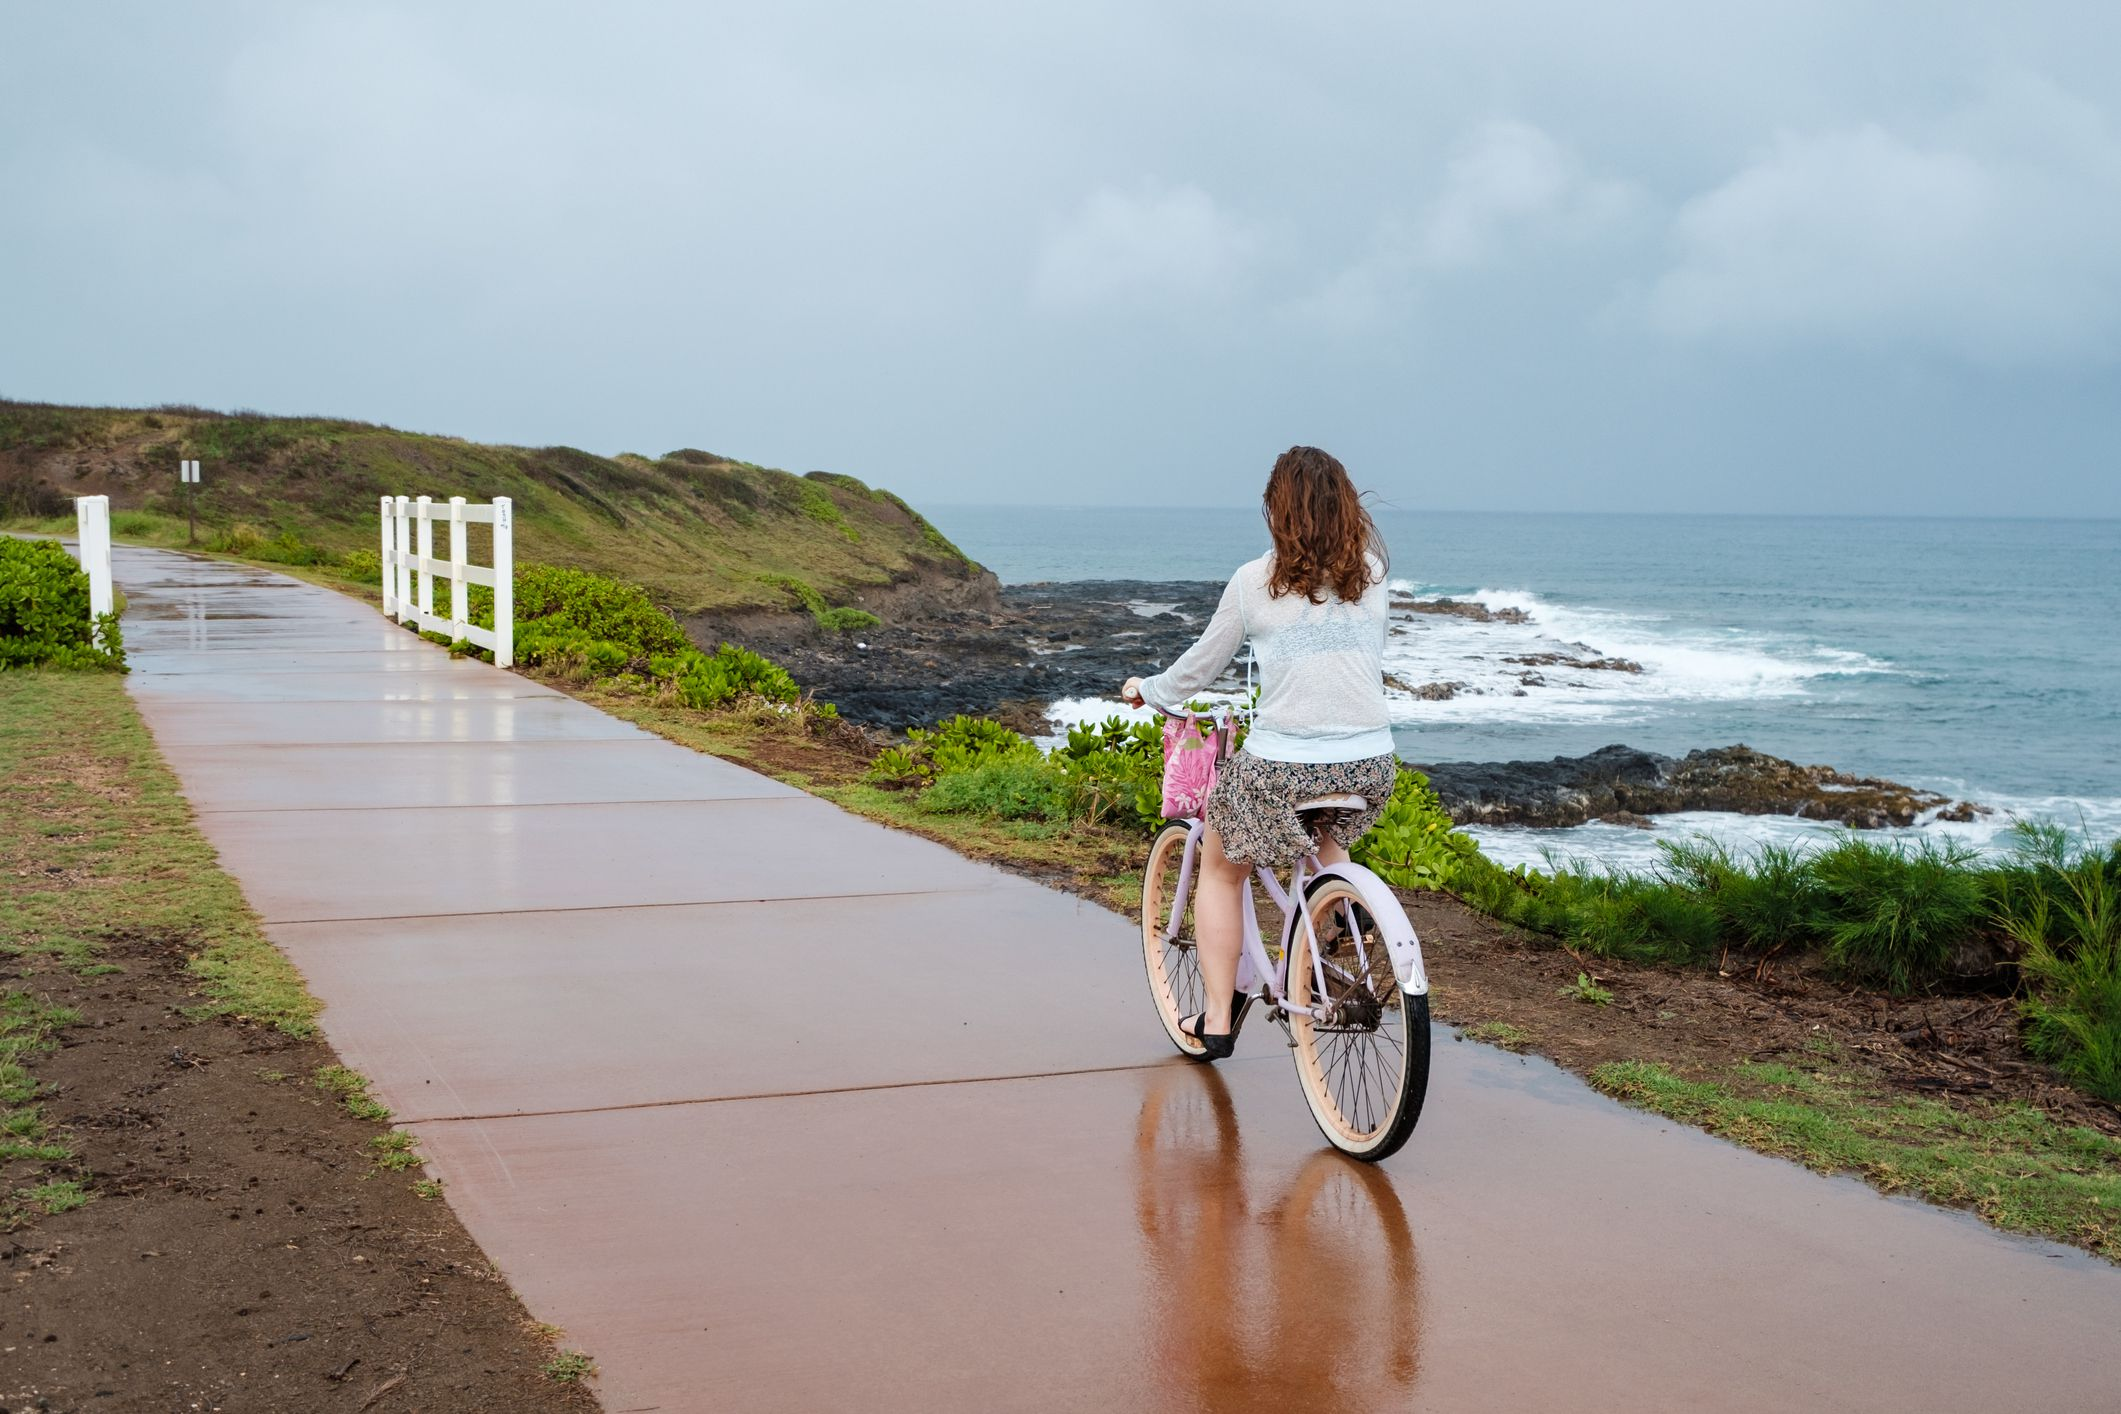 How to Have Fun on a Rainy Day on Kauai